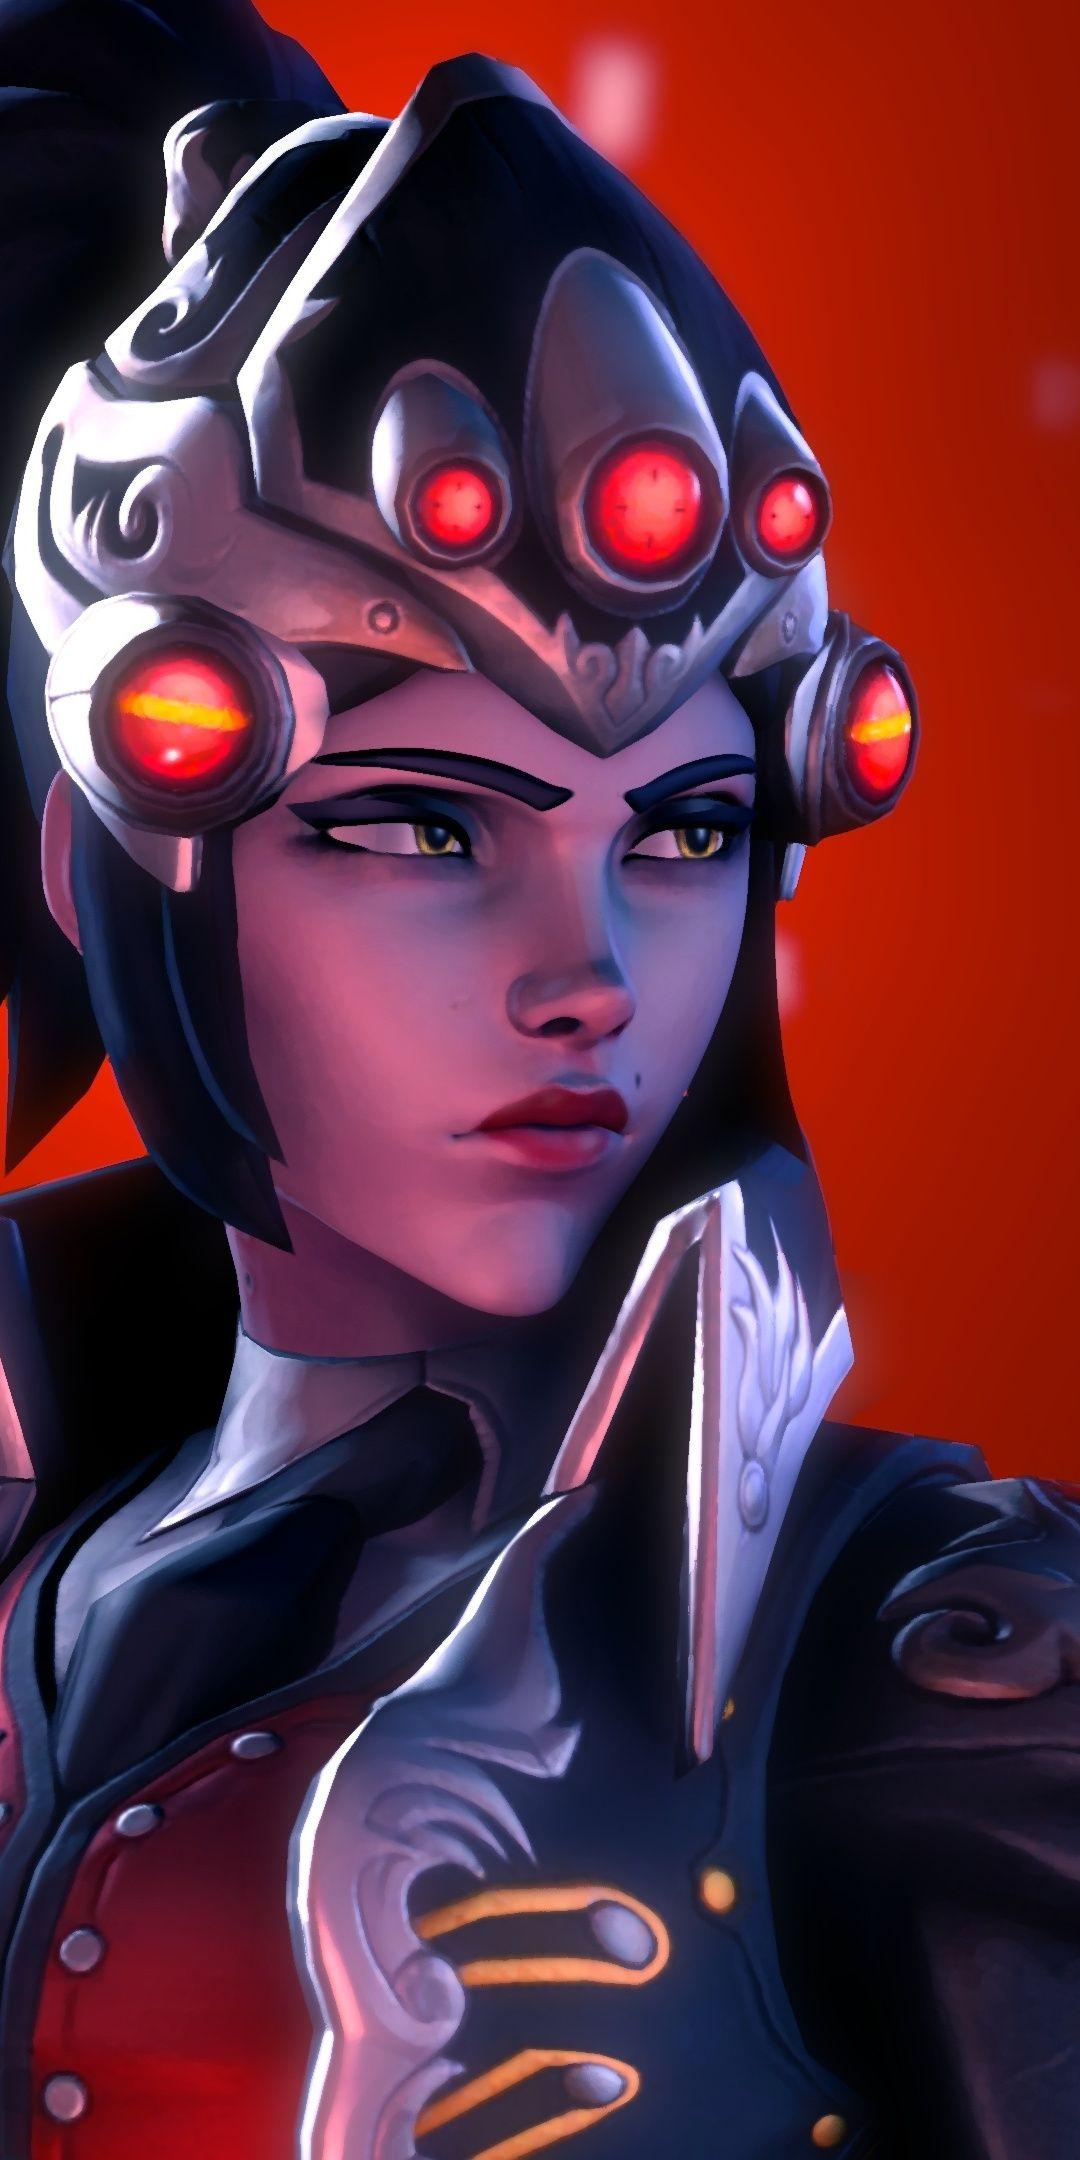 Vampyr Widow Maker Crossover Overwatch Artwork 1080x2160 Wallpaper Overwatch Drawings Overwatch Fan Art Overwatch Widowmaker